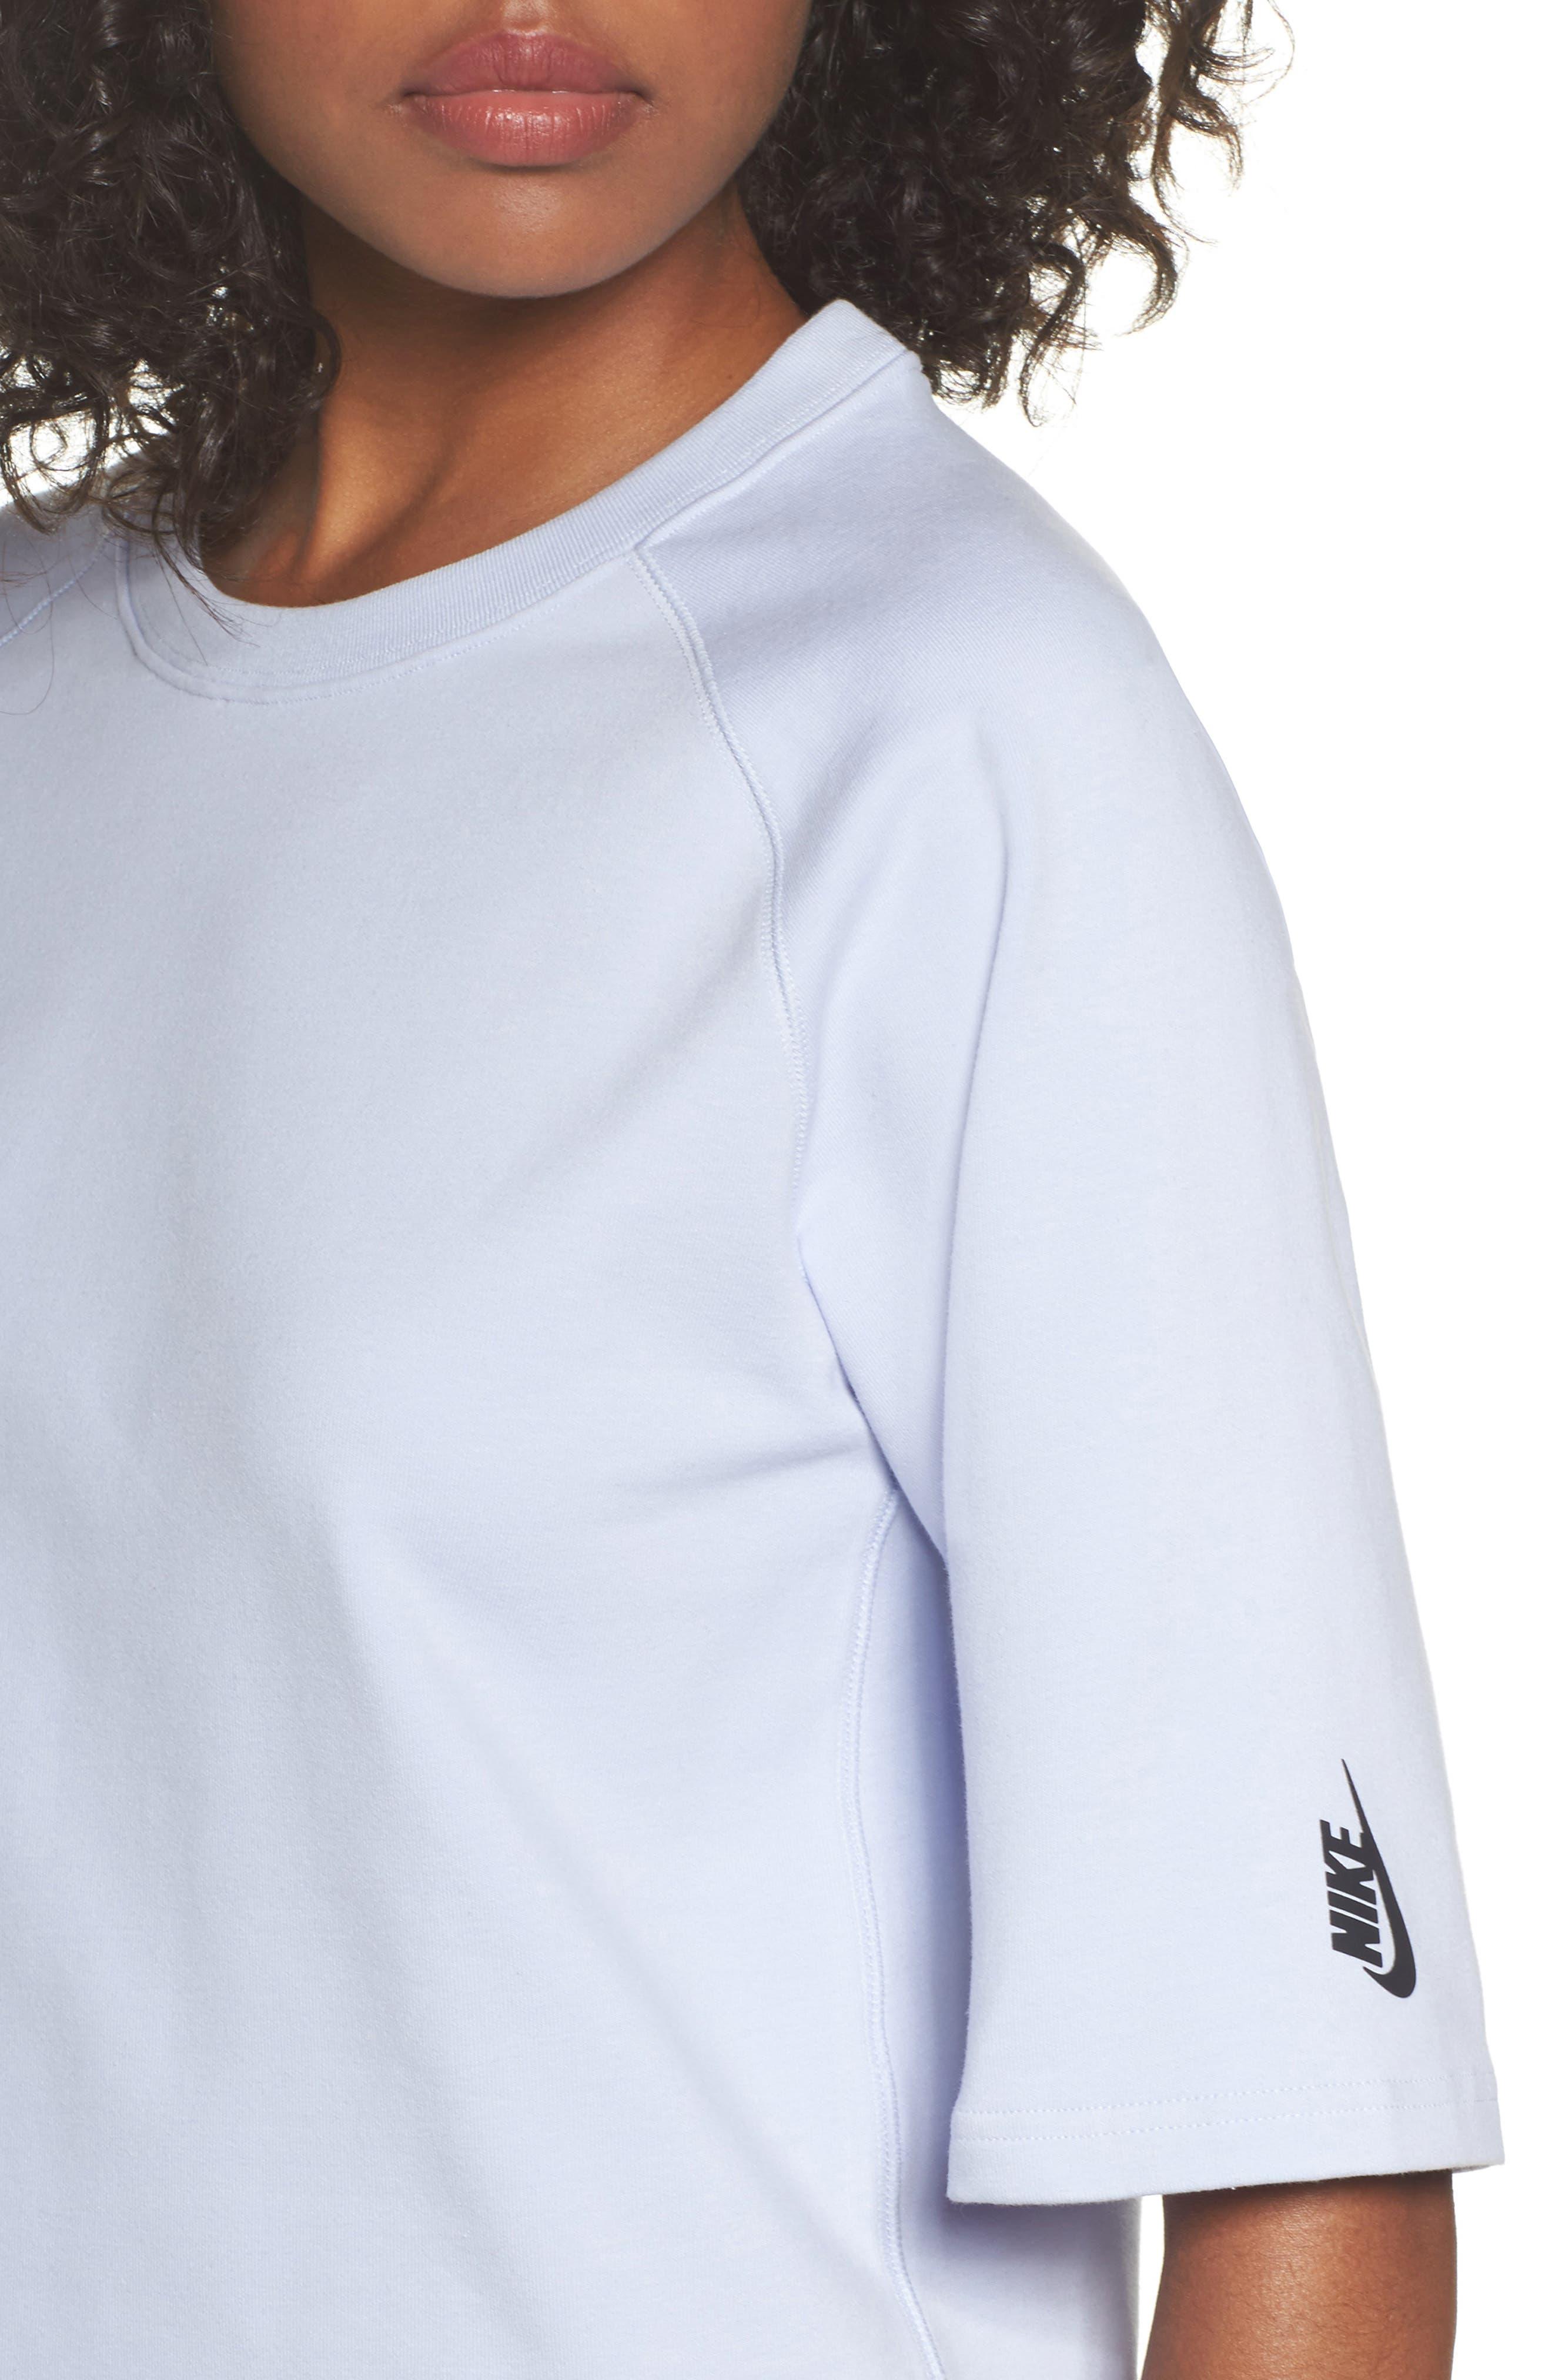 NikeLab Essential Fleece Top,                             Alternate thumbnail 15, color,